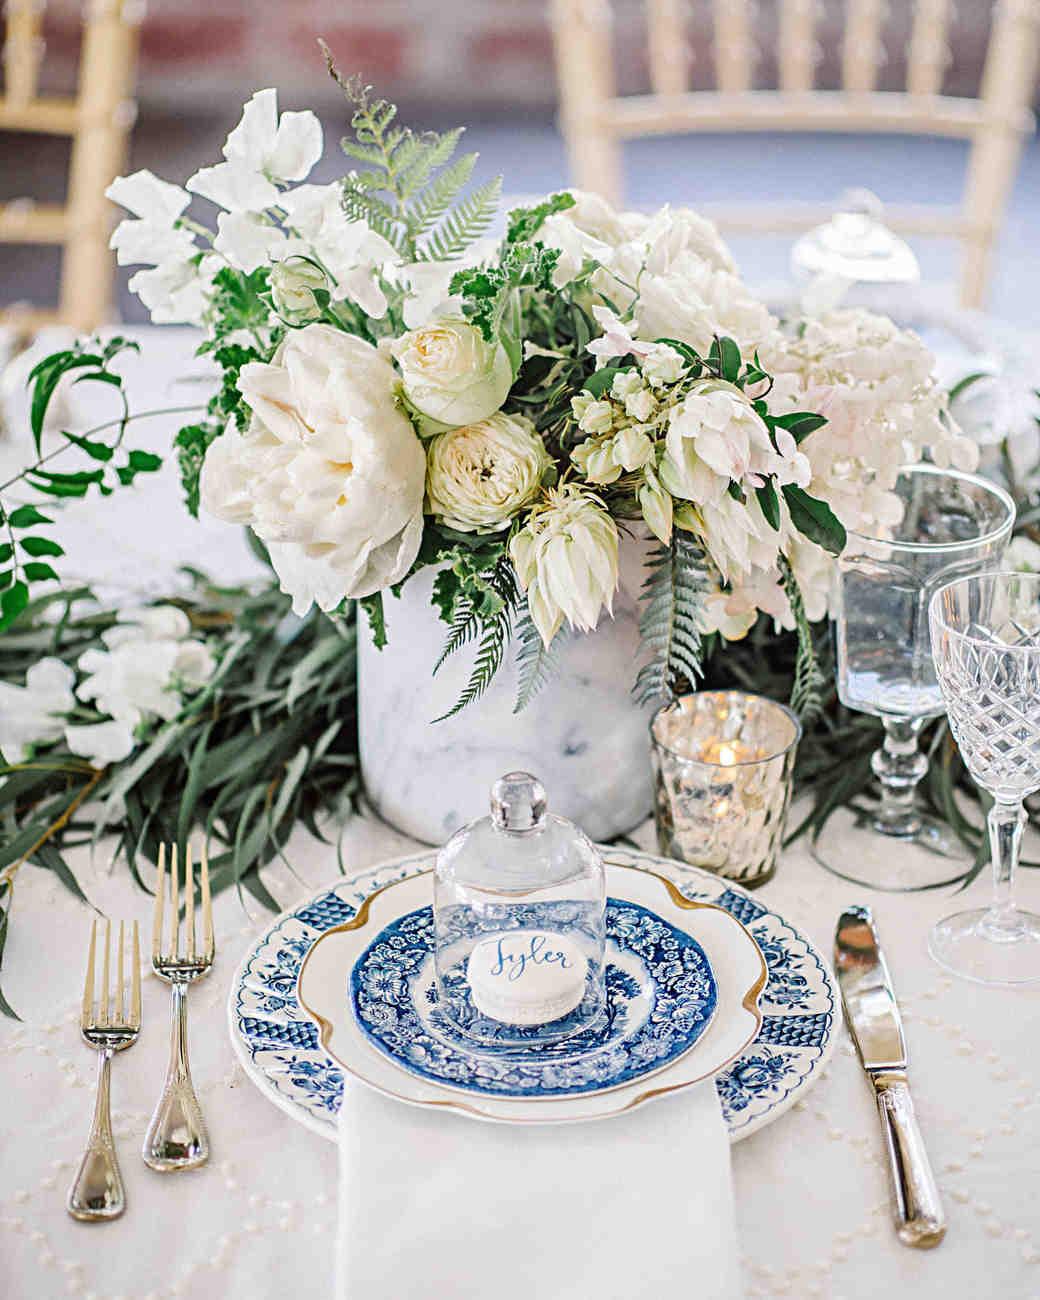 wholesale glass vases international of 79 white wedding centerpieces martha stewart weddings regarding hannah steve wedding california china macarons